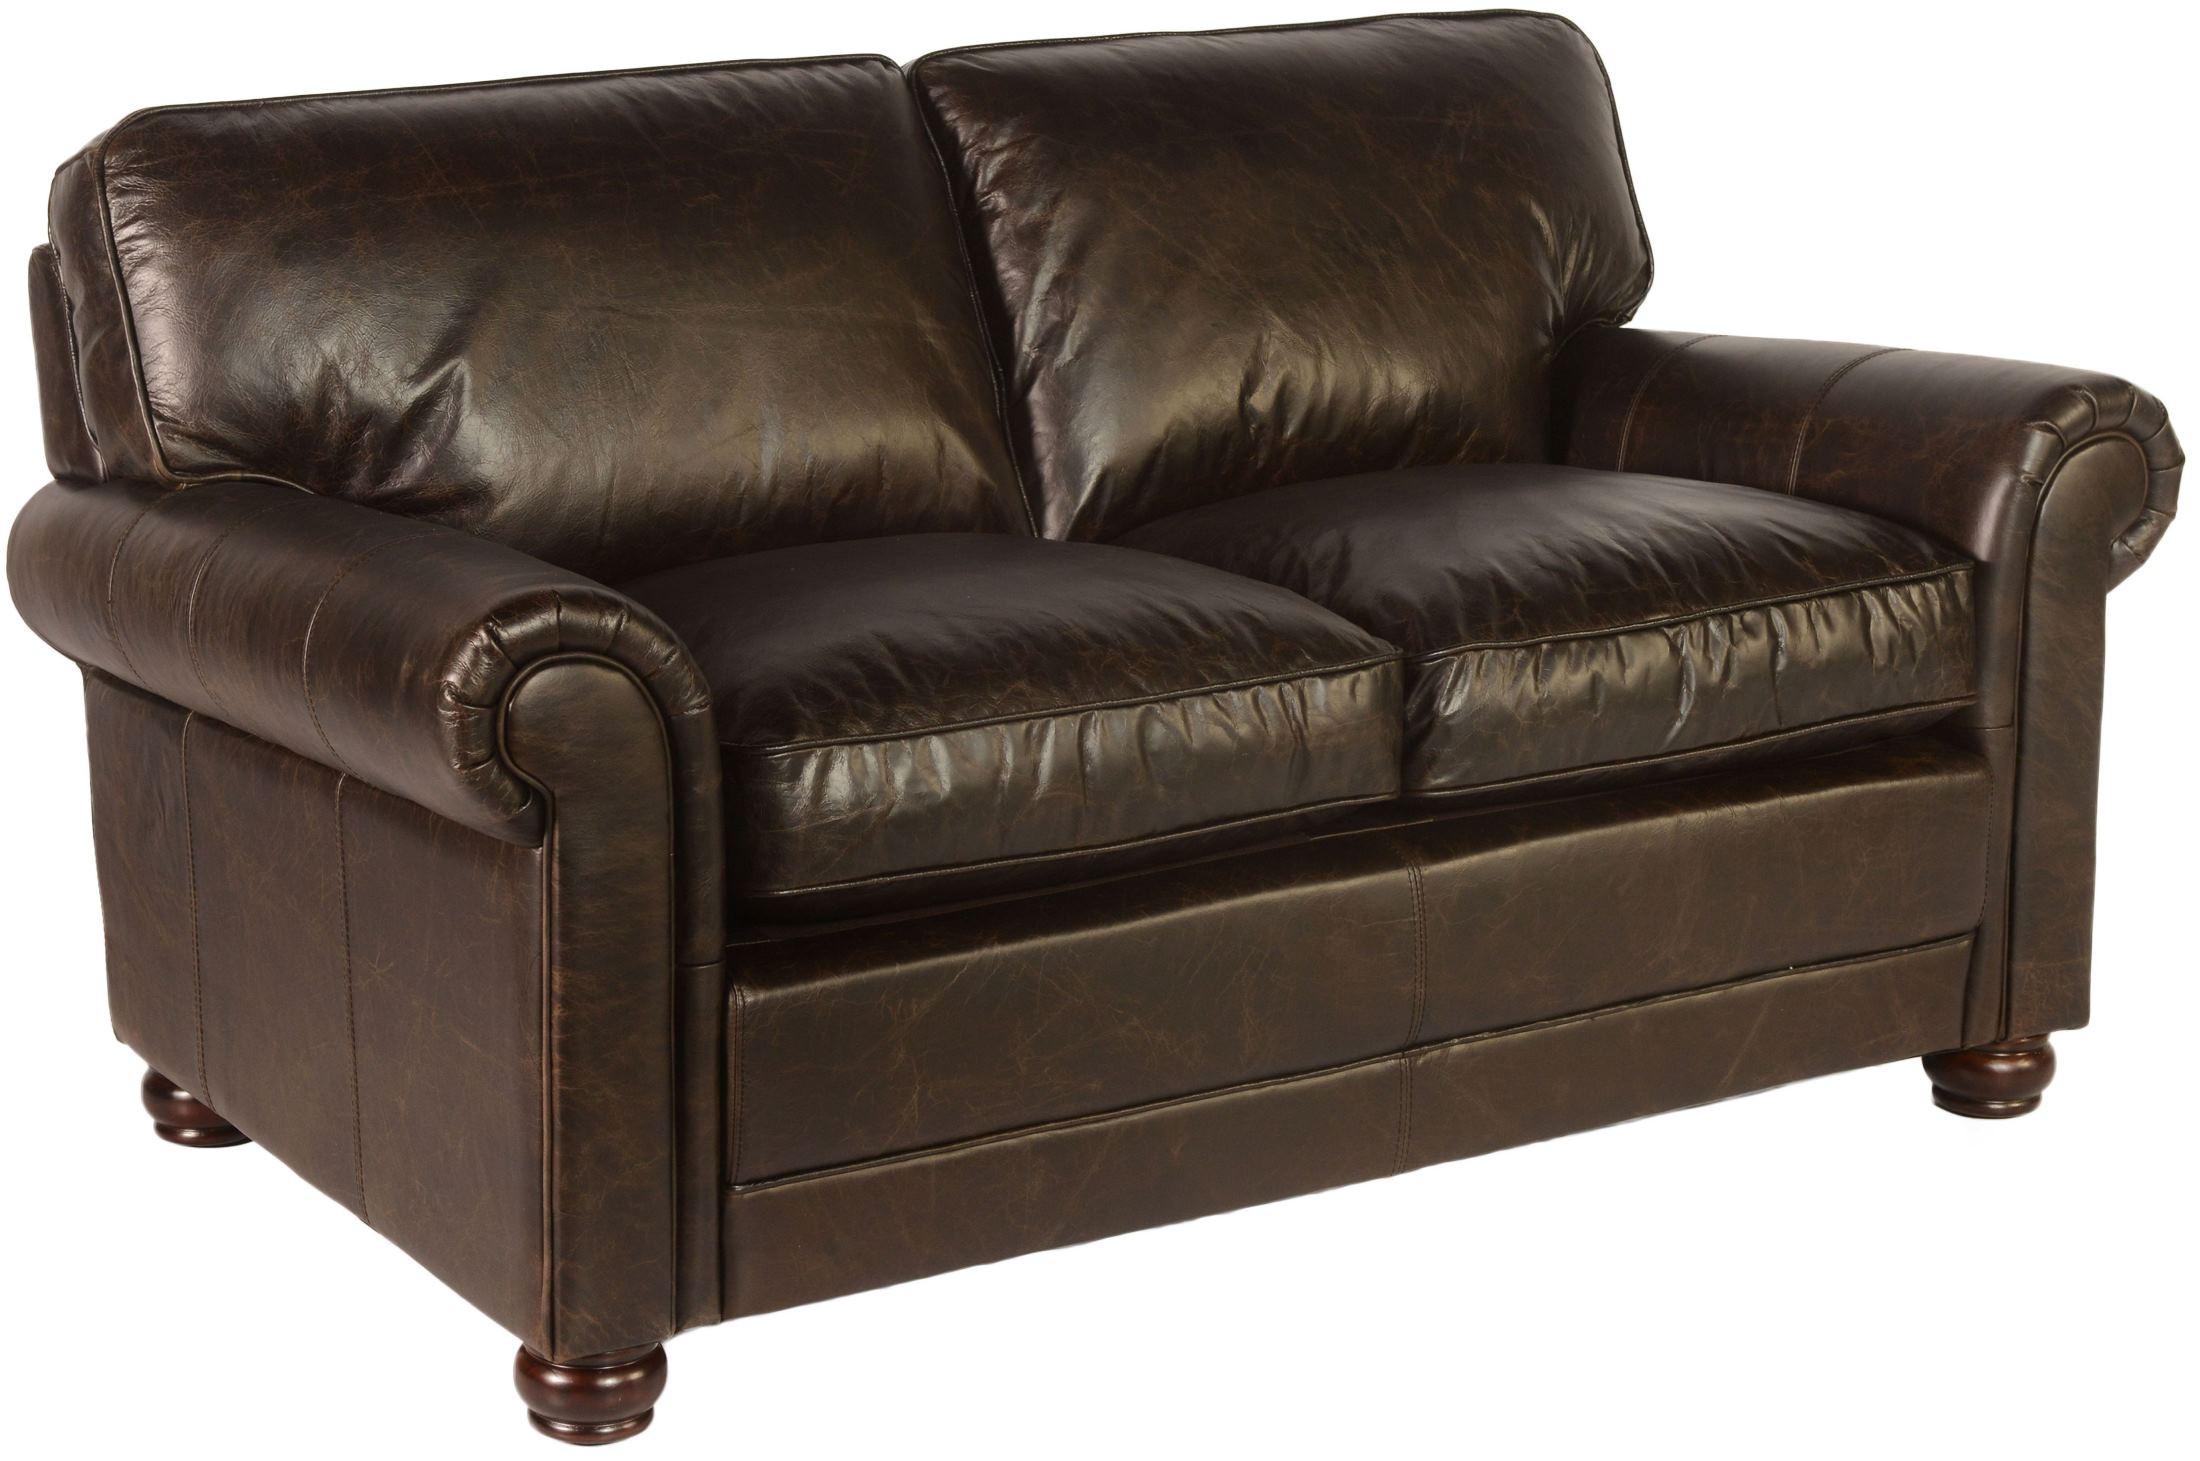 next brompton leather sofa chesterfield cuero chile genesis chocolate loveseat from lazzaro